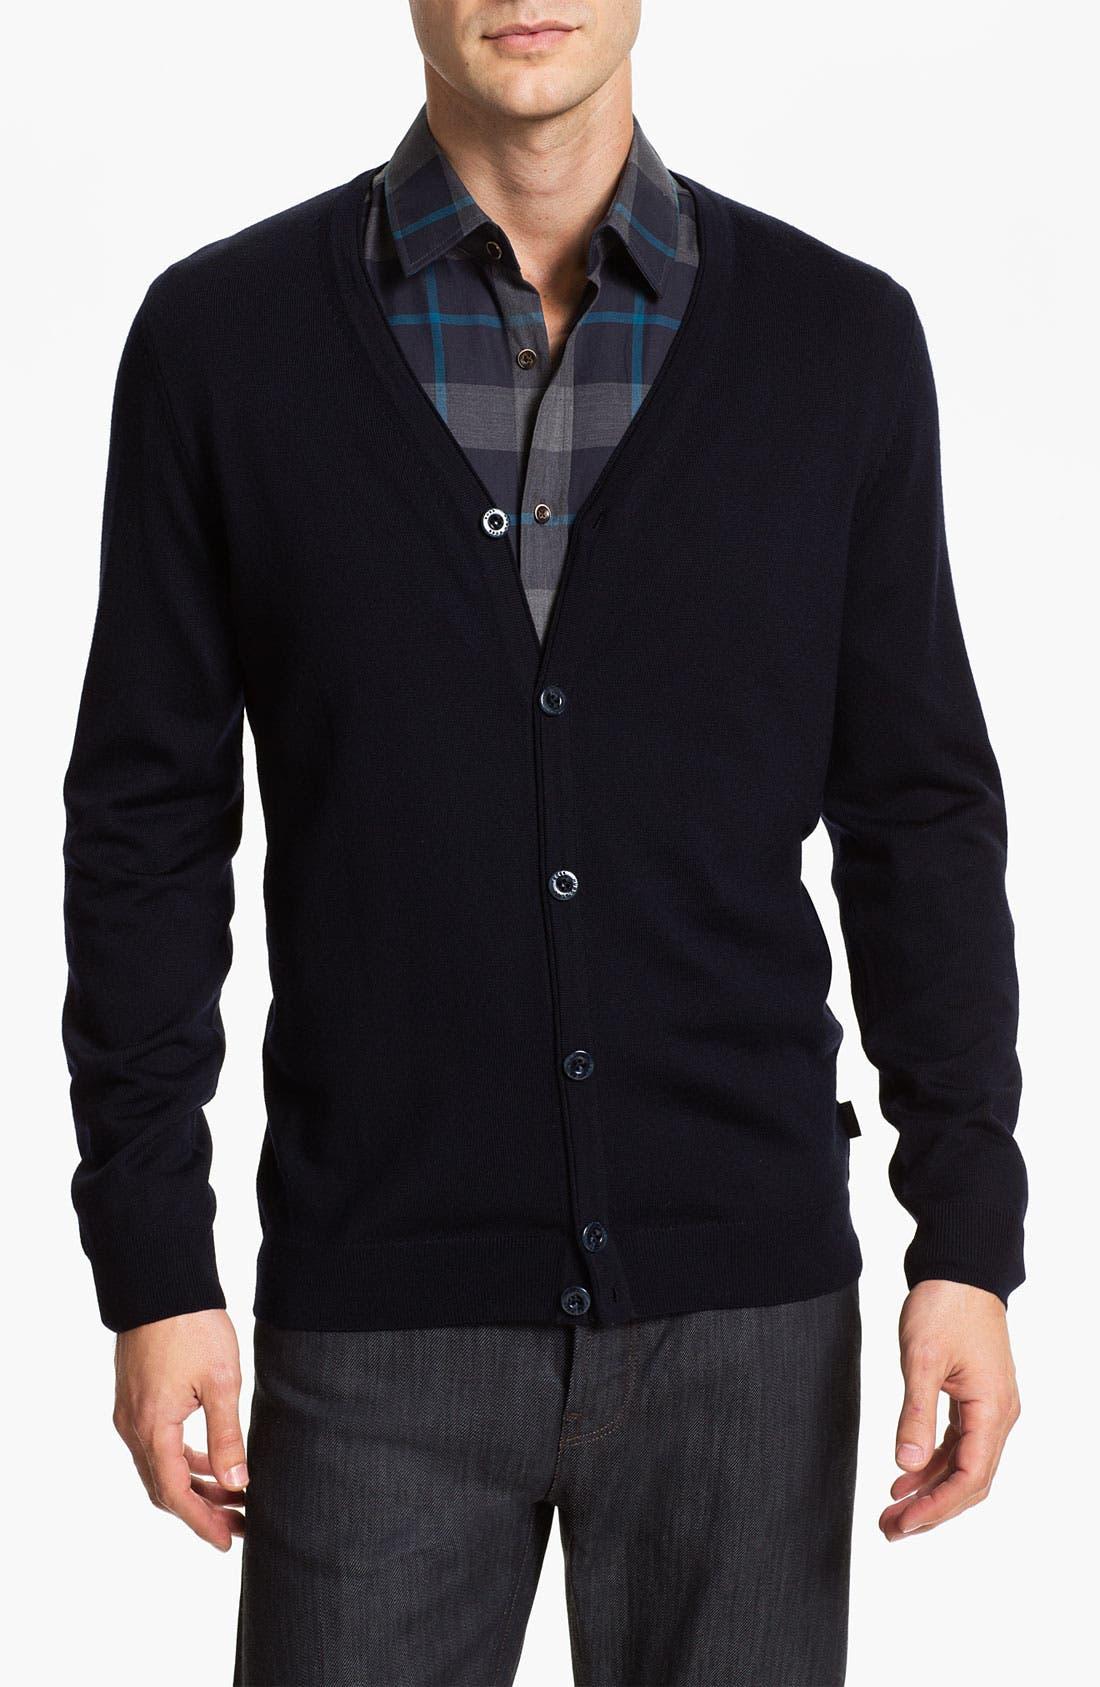 Black 'Baltimore' Wool Button Cardigan,                             Main thumbnail 1, color,                             001